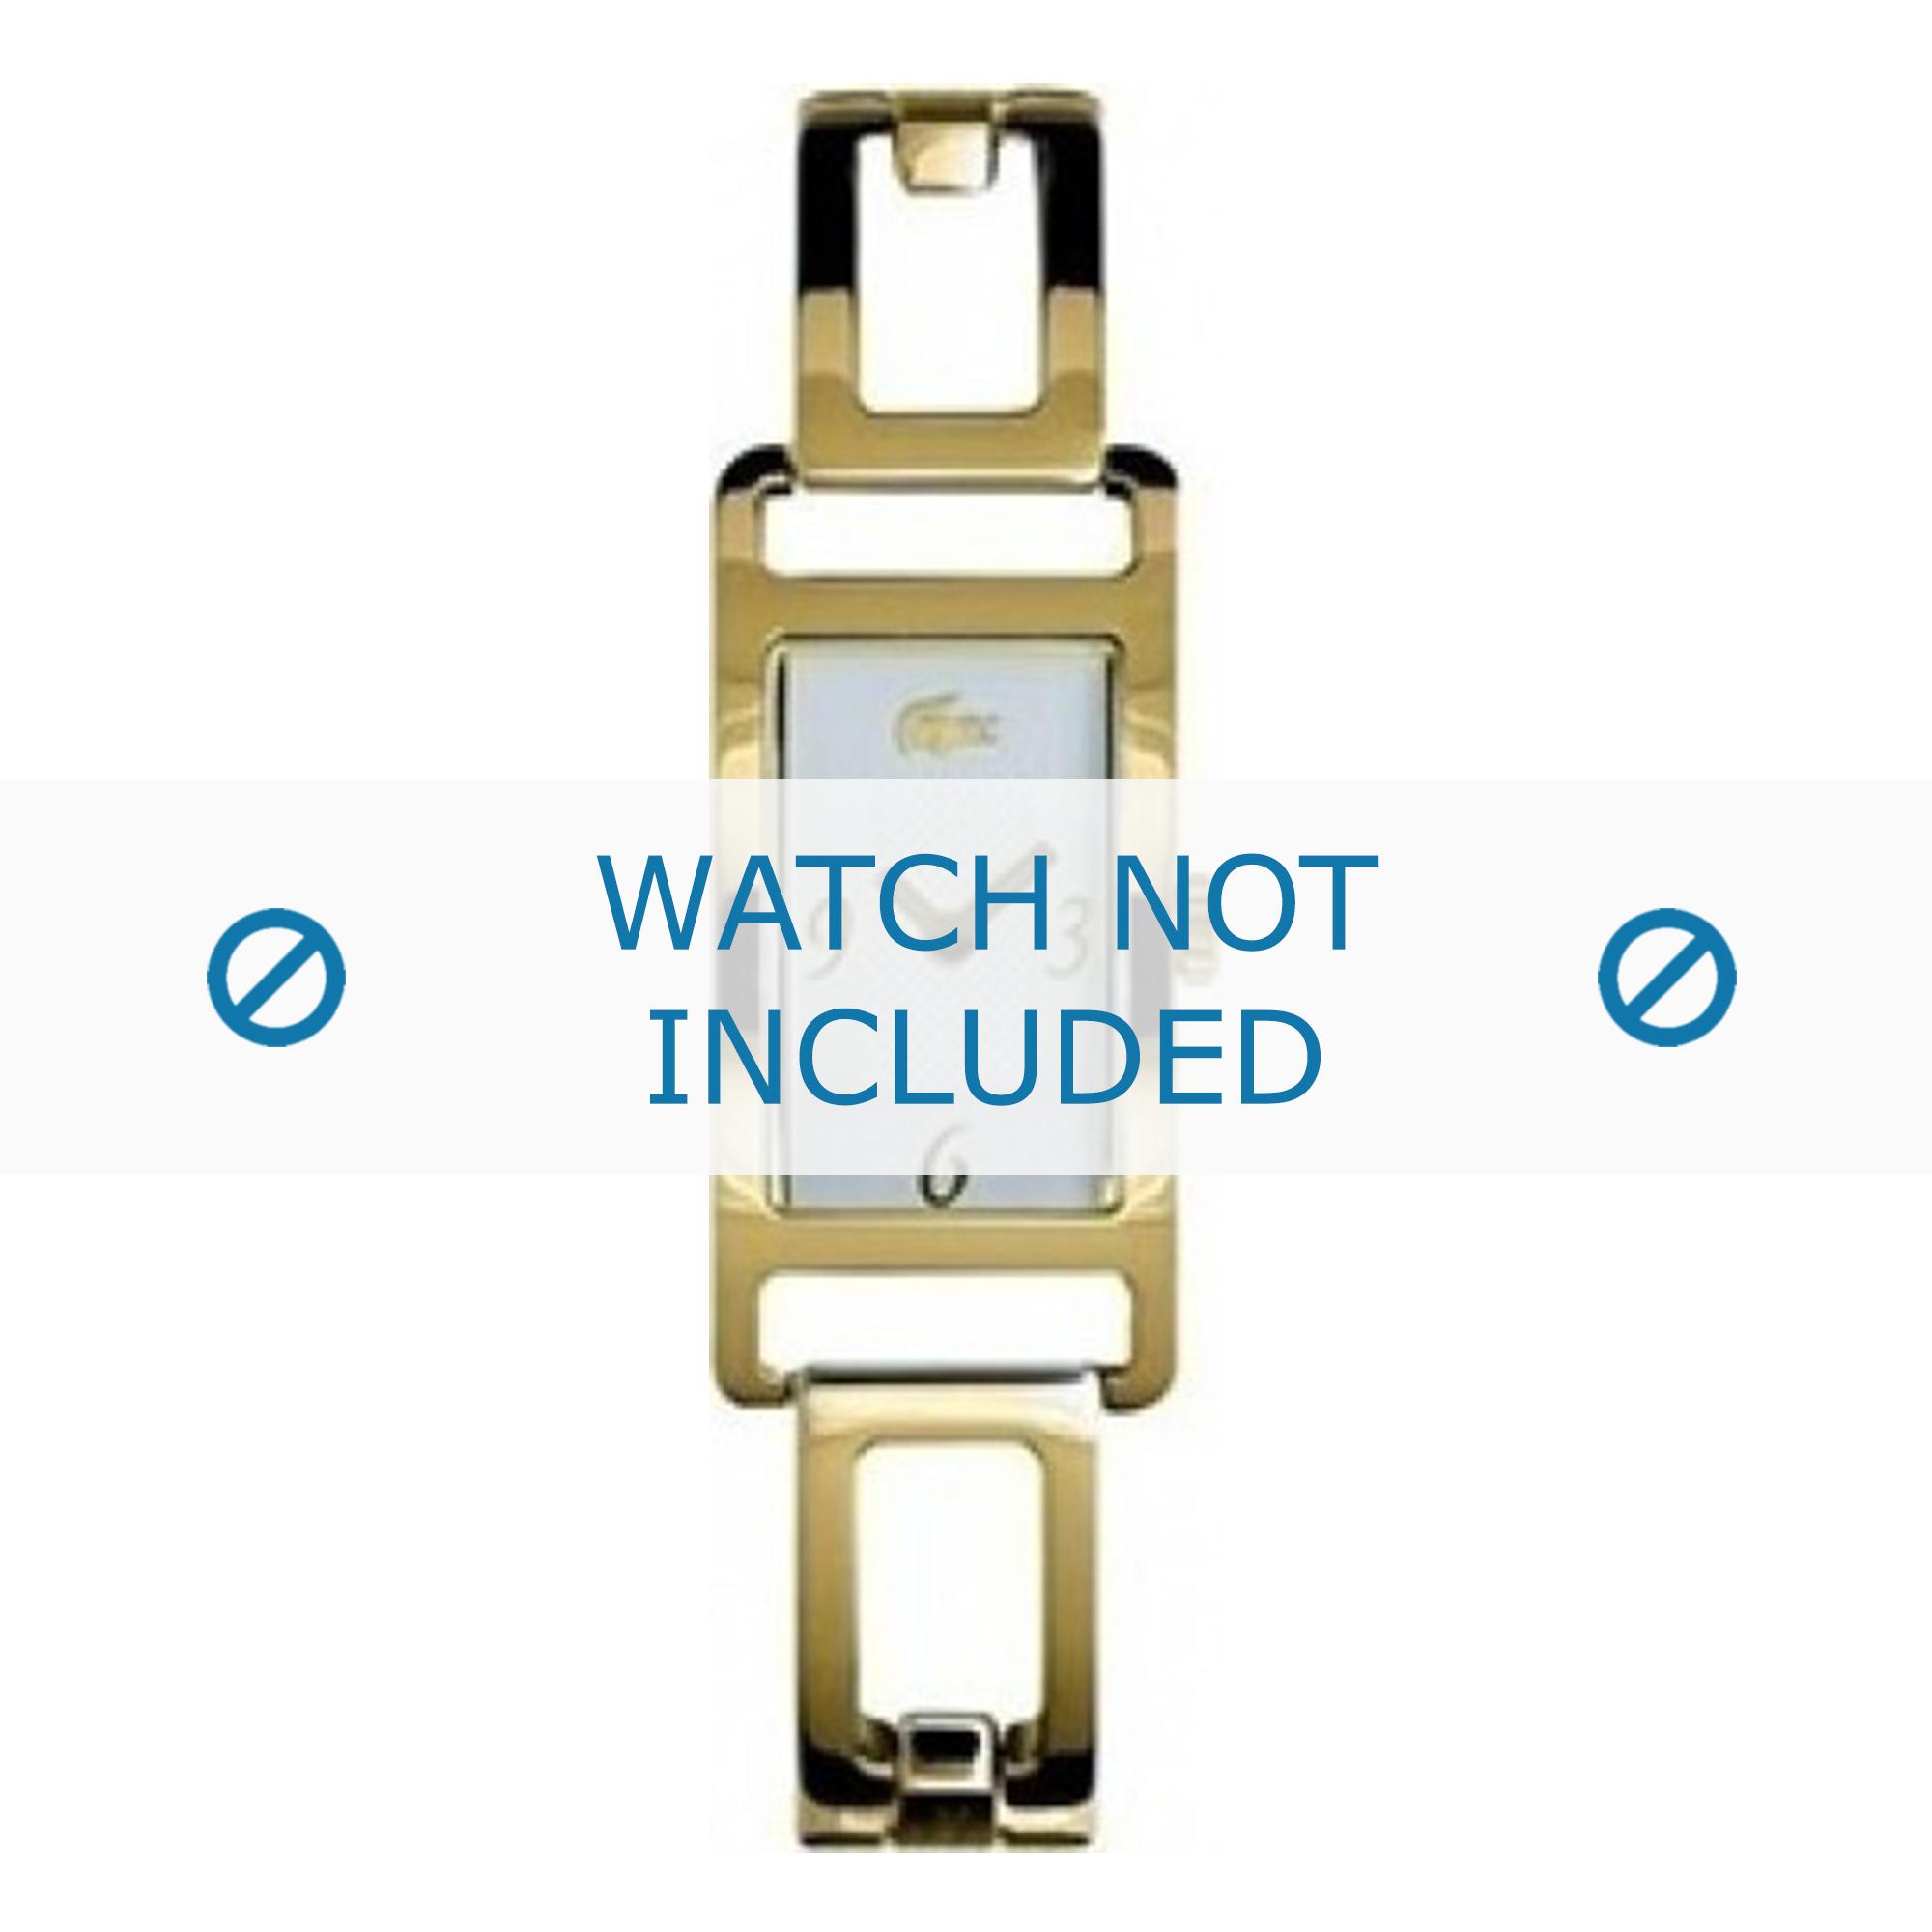 Lacoste horlogeband LC-05-3-21-0008 / Staal Goud